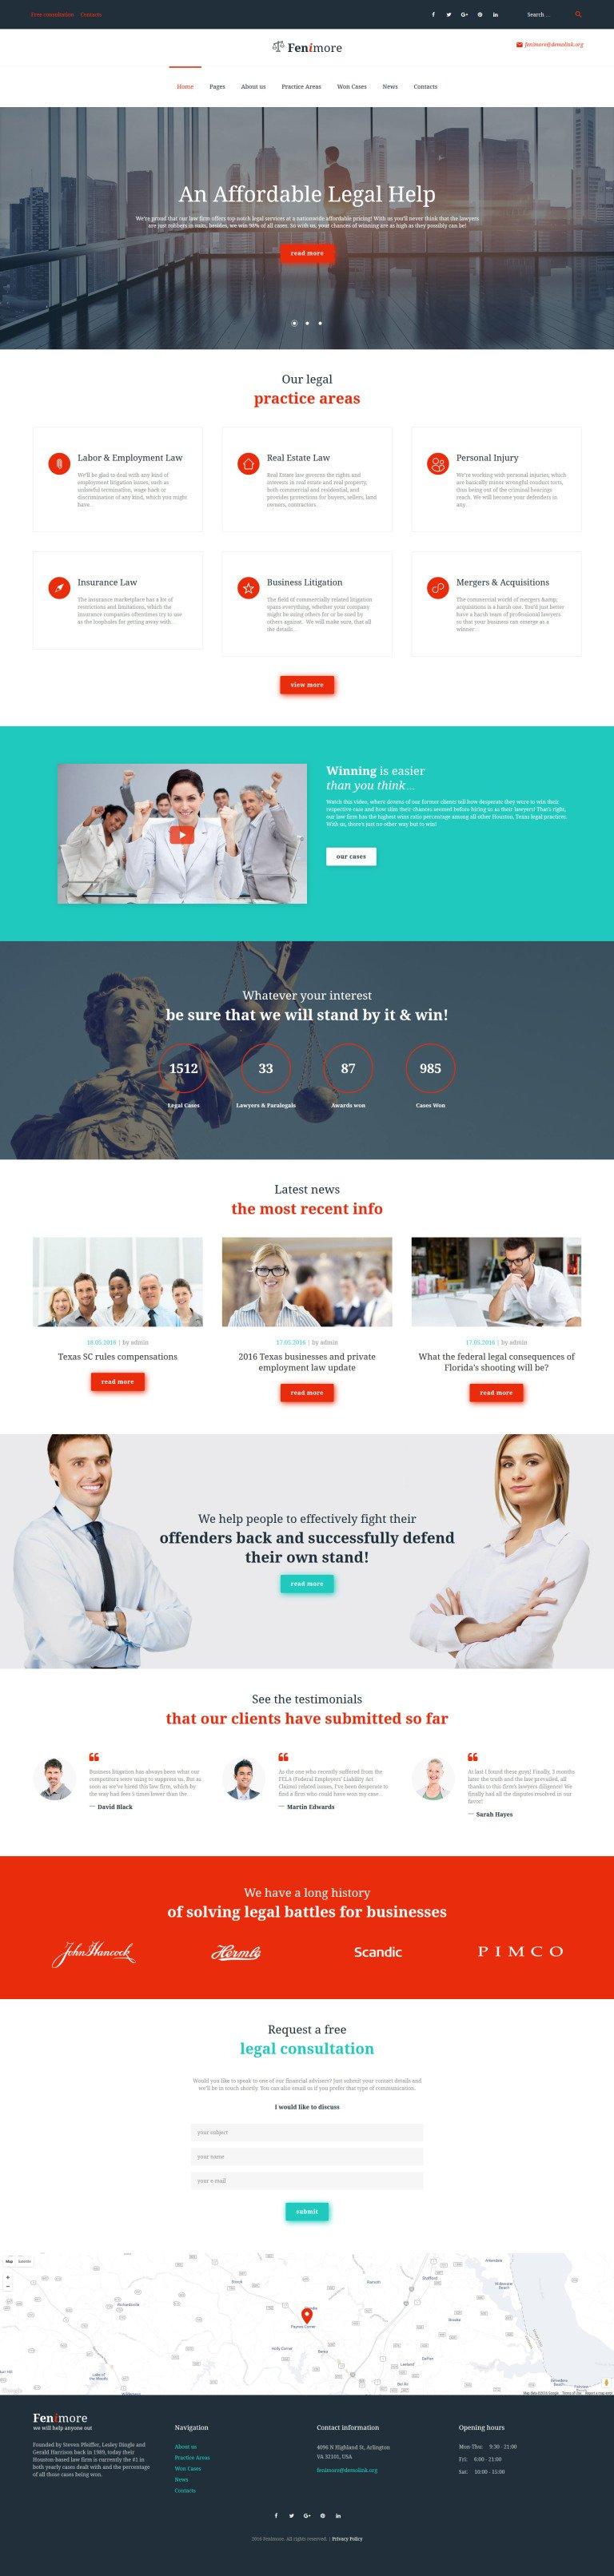 Fenimore - Law Firm WordPress Theme New Screenshots BIG